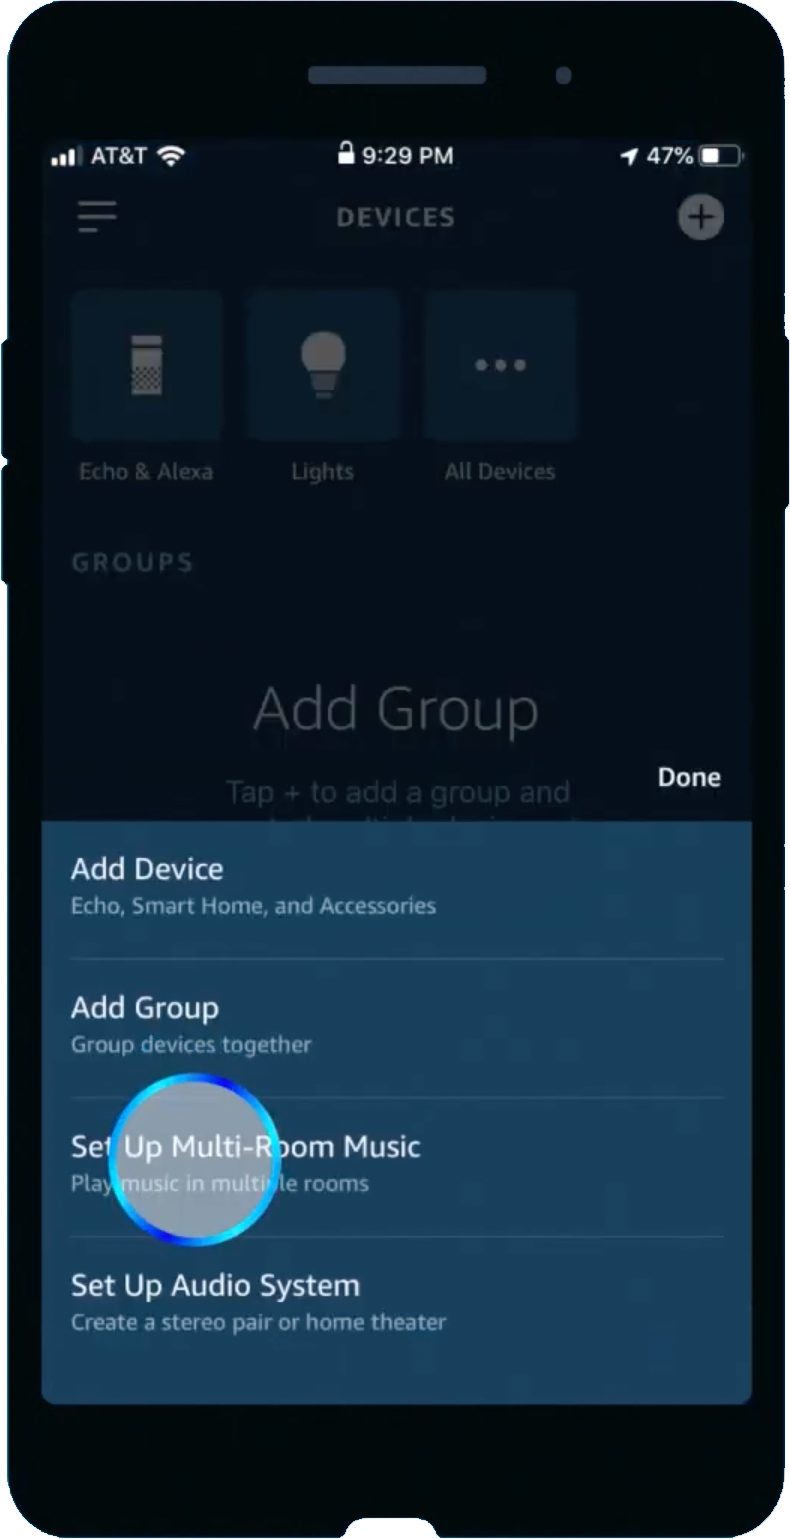 Amazon Alexa app set up multi-room music